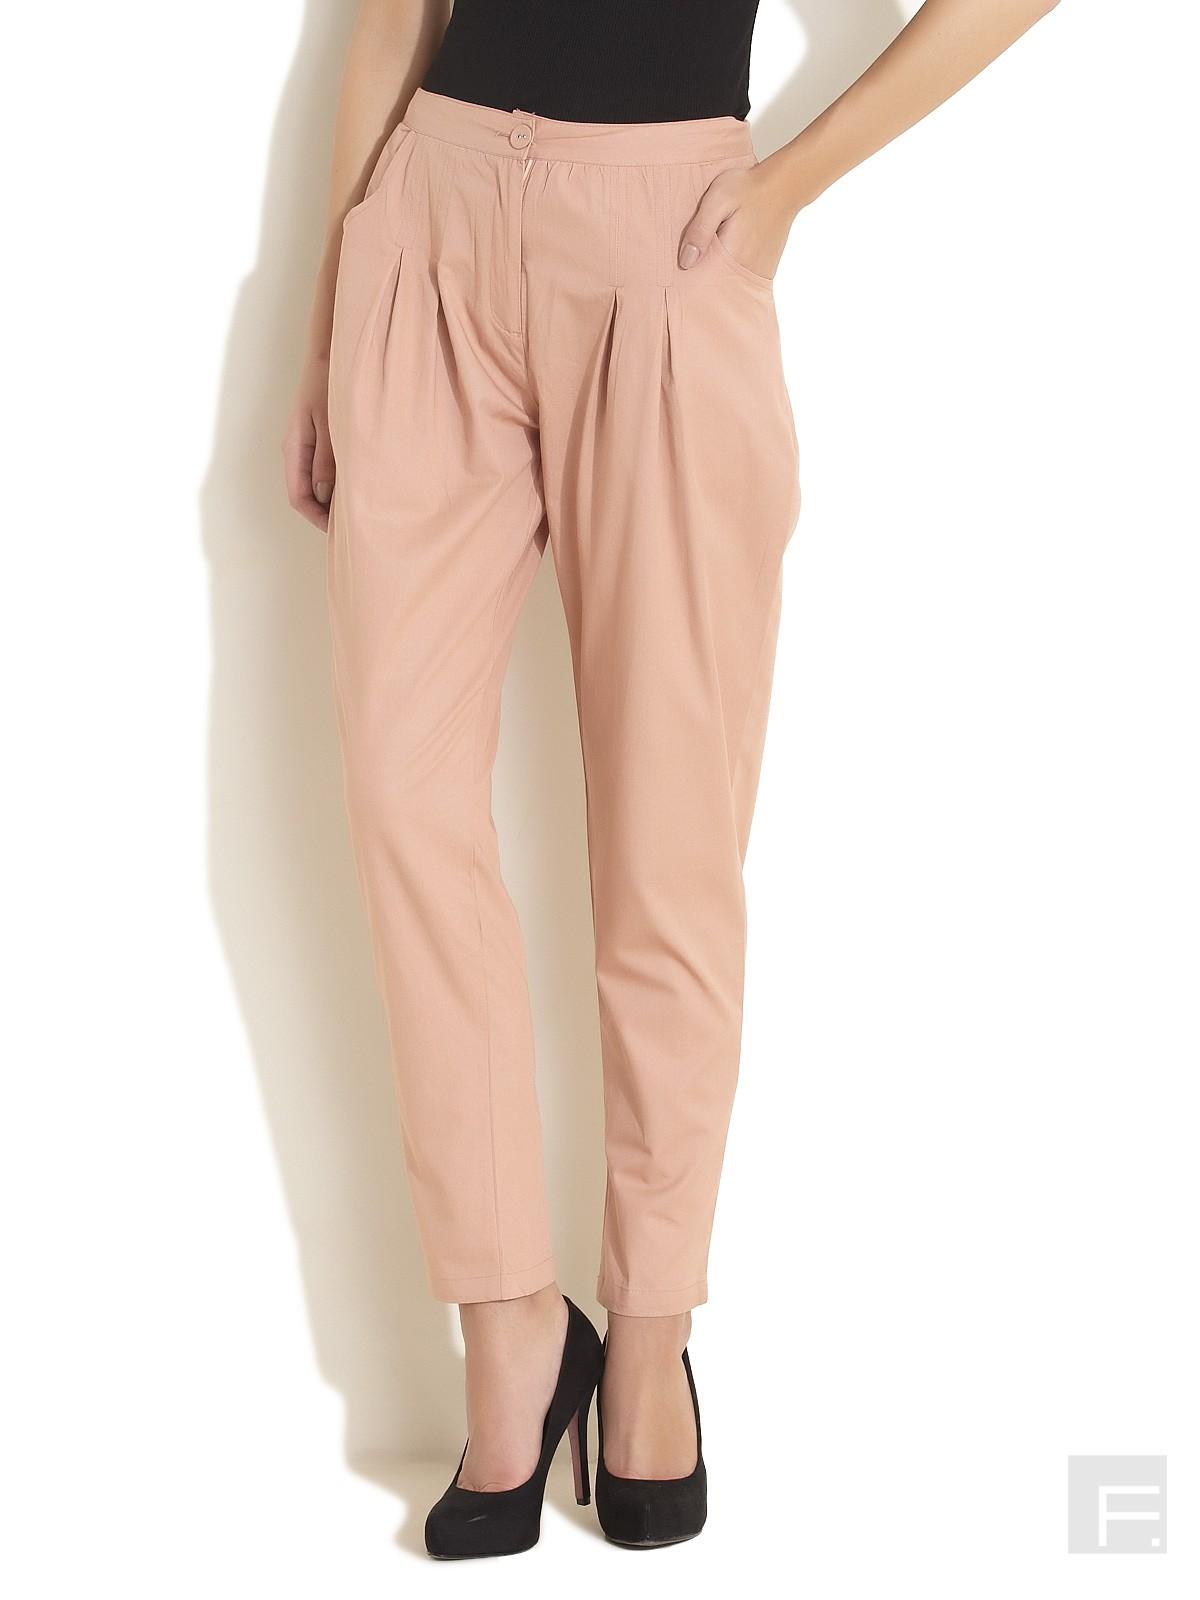 trousers for women: must for each wardrobe wipjgmd